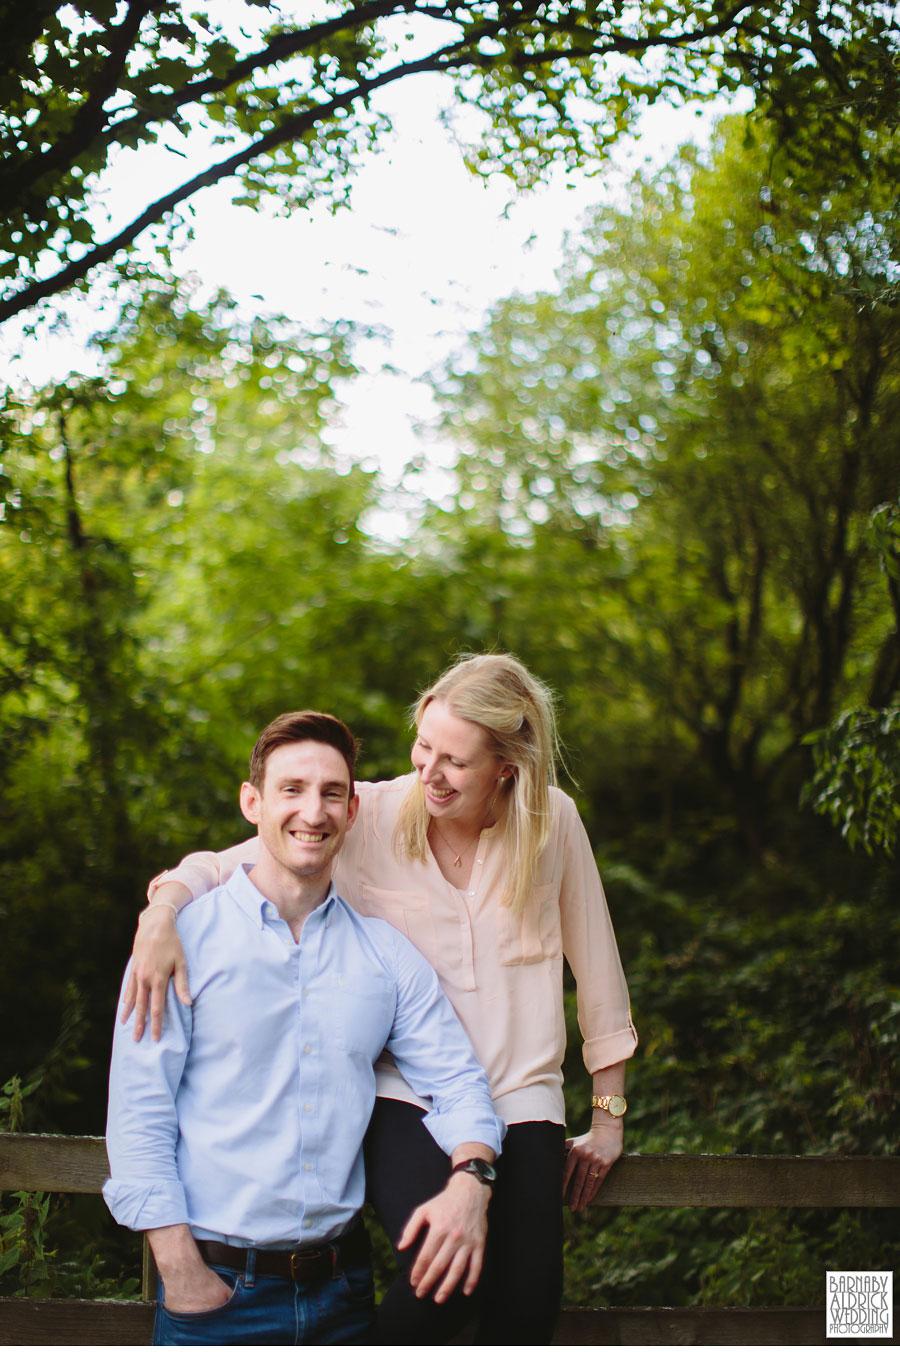 Ilkley Pre-Wedding Photography 009